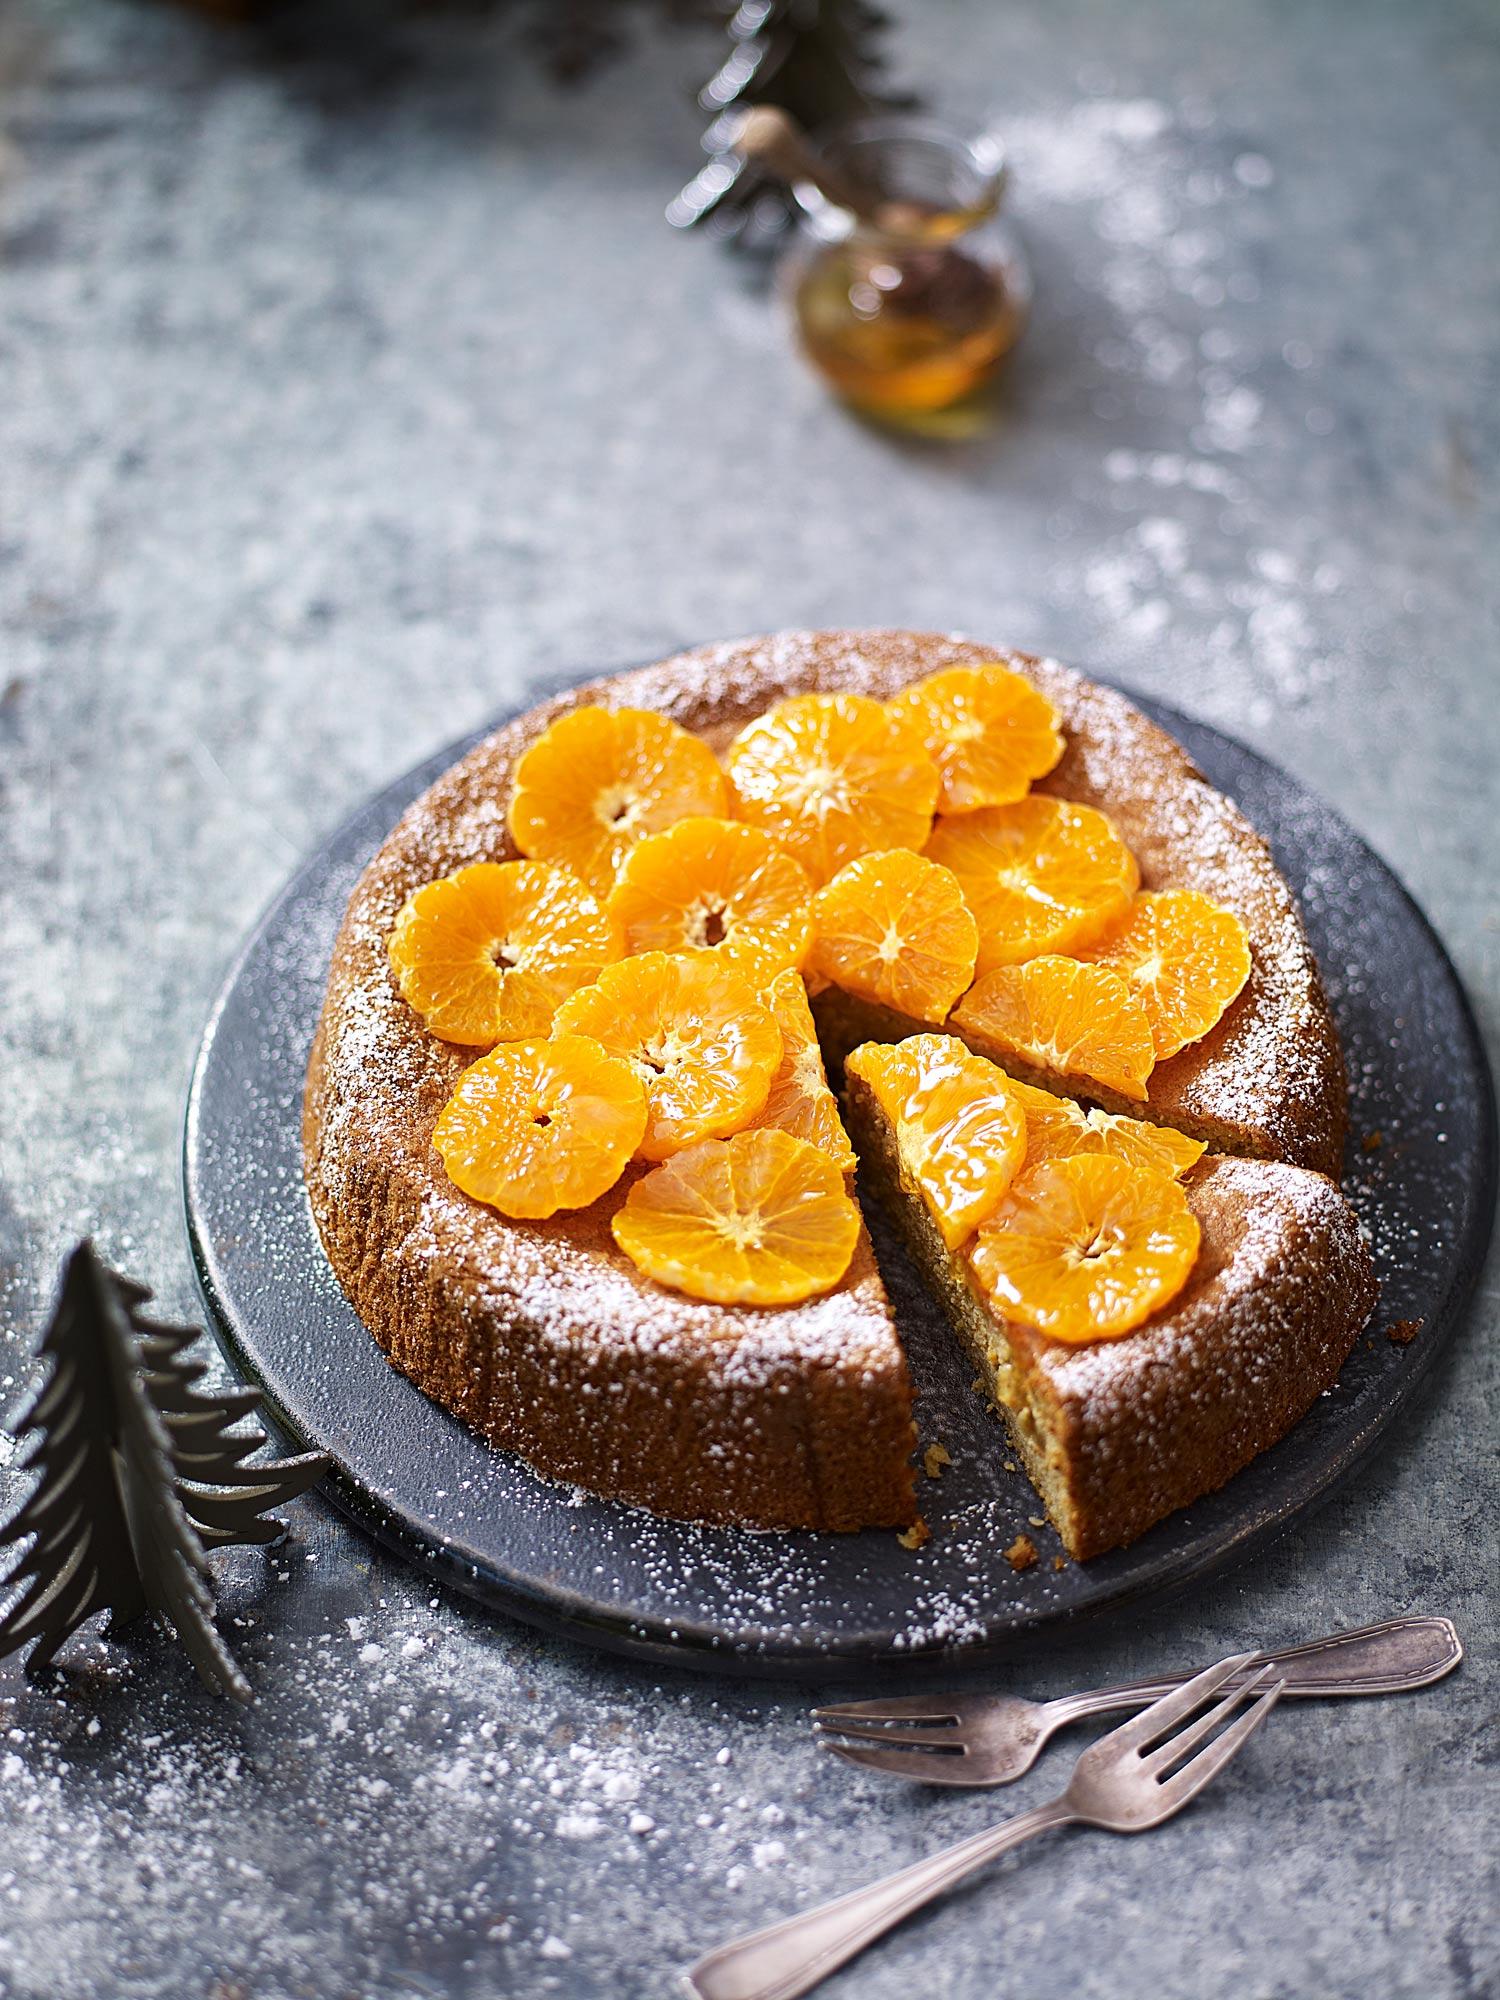 Stuart West - dessert